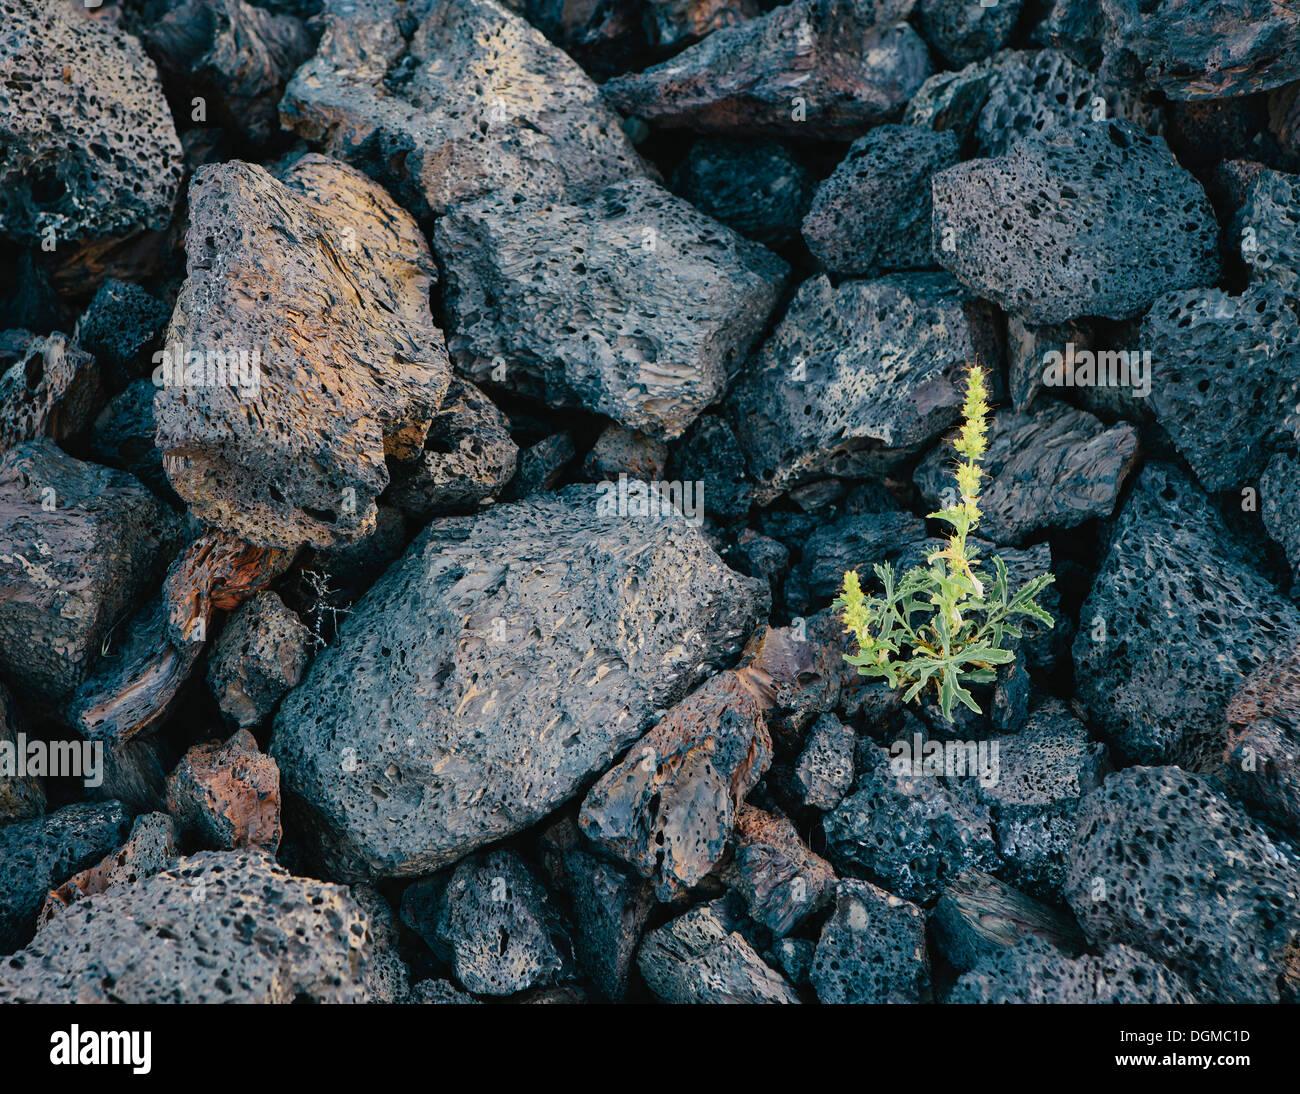 Green pequeño disparar campos de lava solidificada de roca volcánica de los cráteres de la Luna Monumento Nacional Snake River Plain Idaho central Imagen De Stock